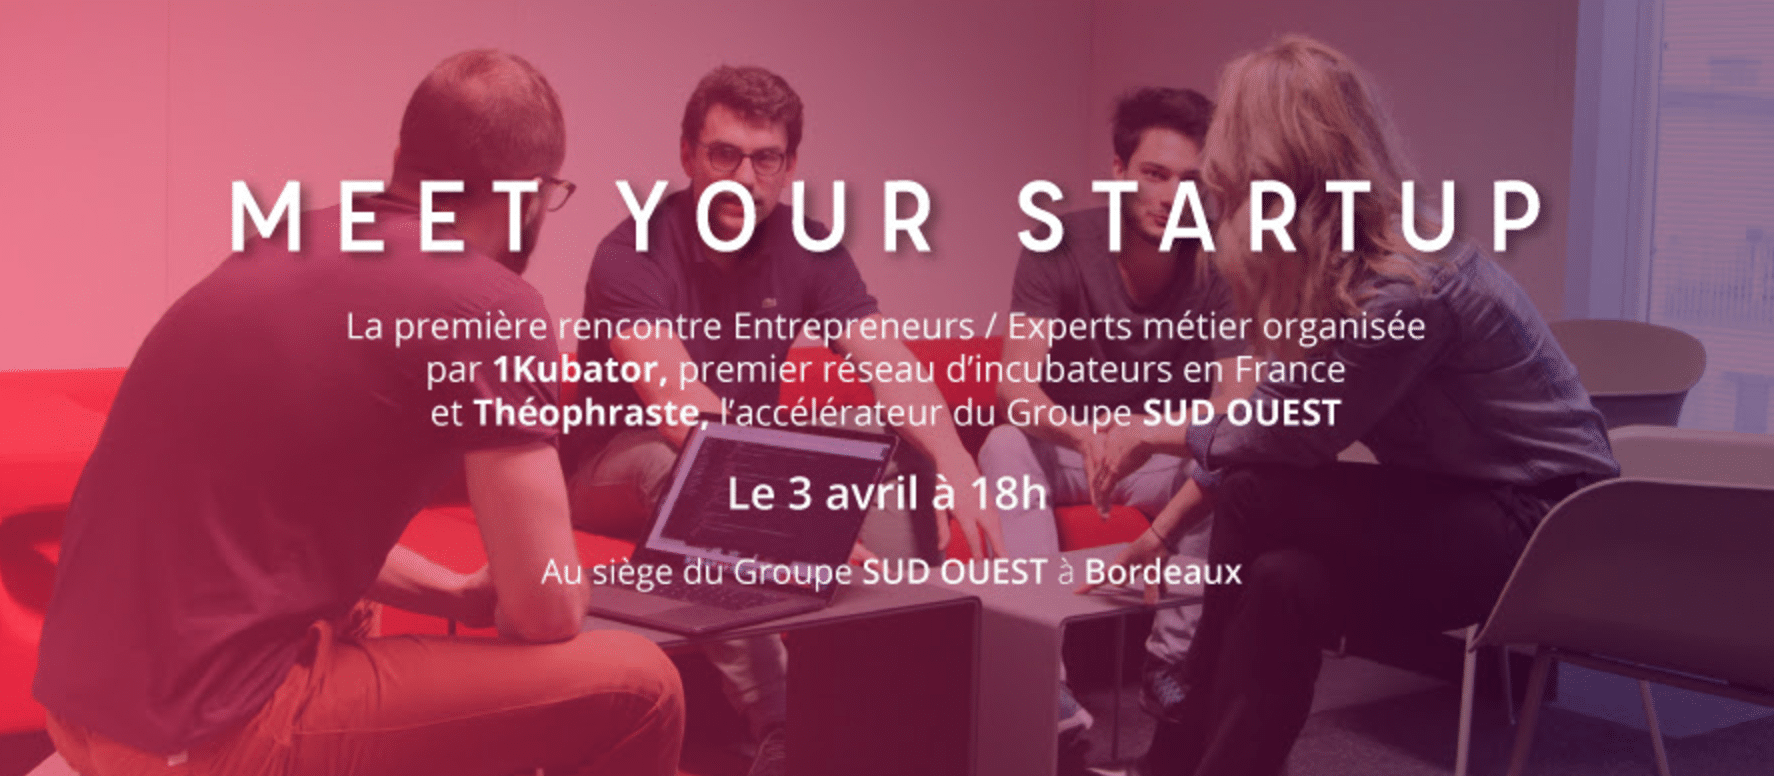 meet your startup